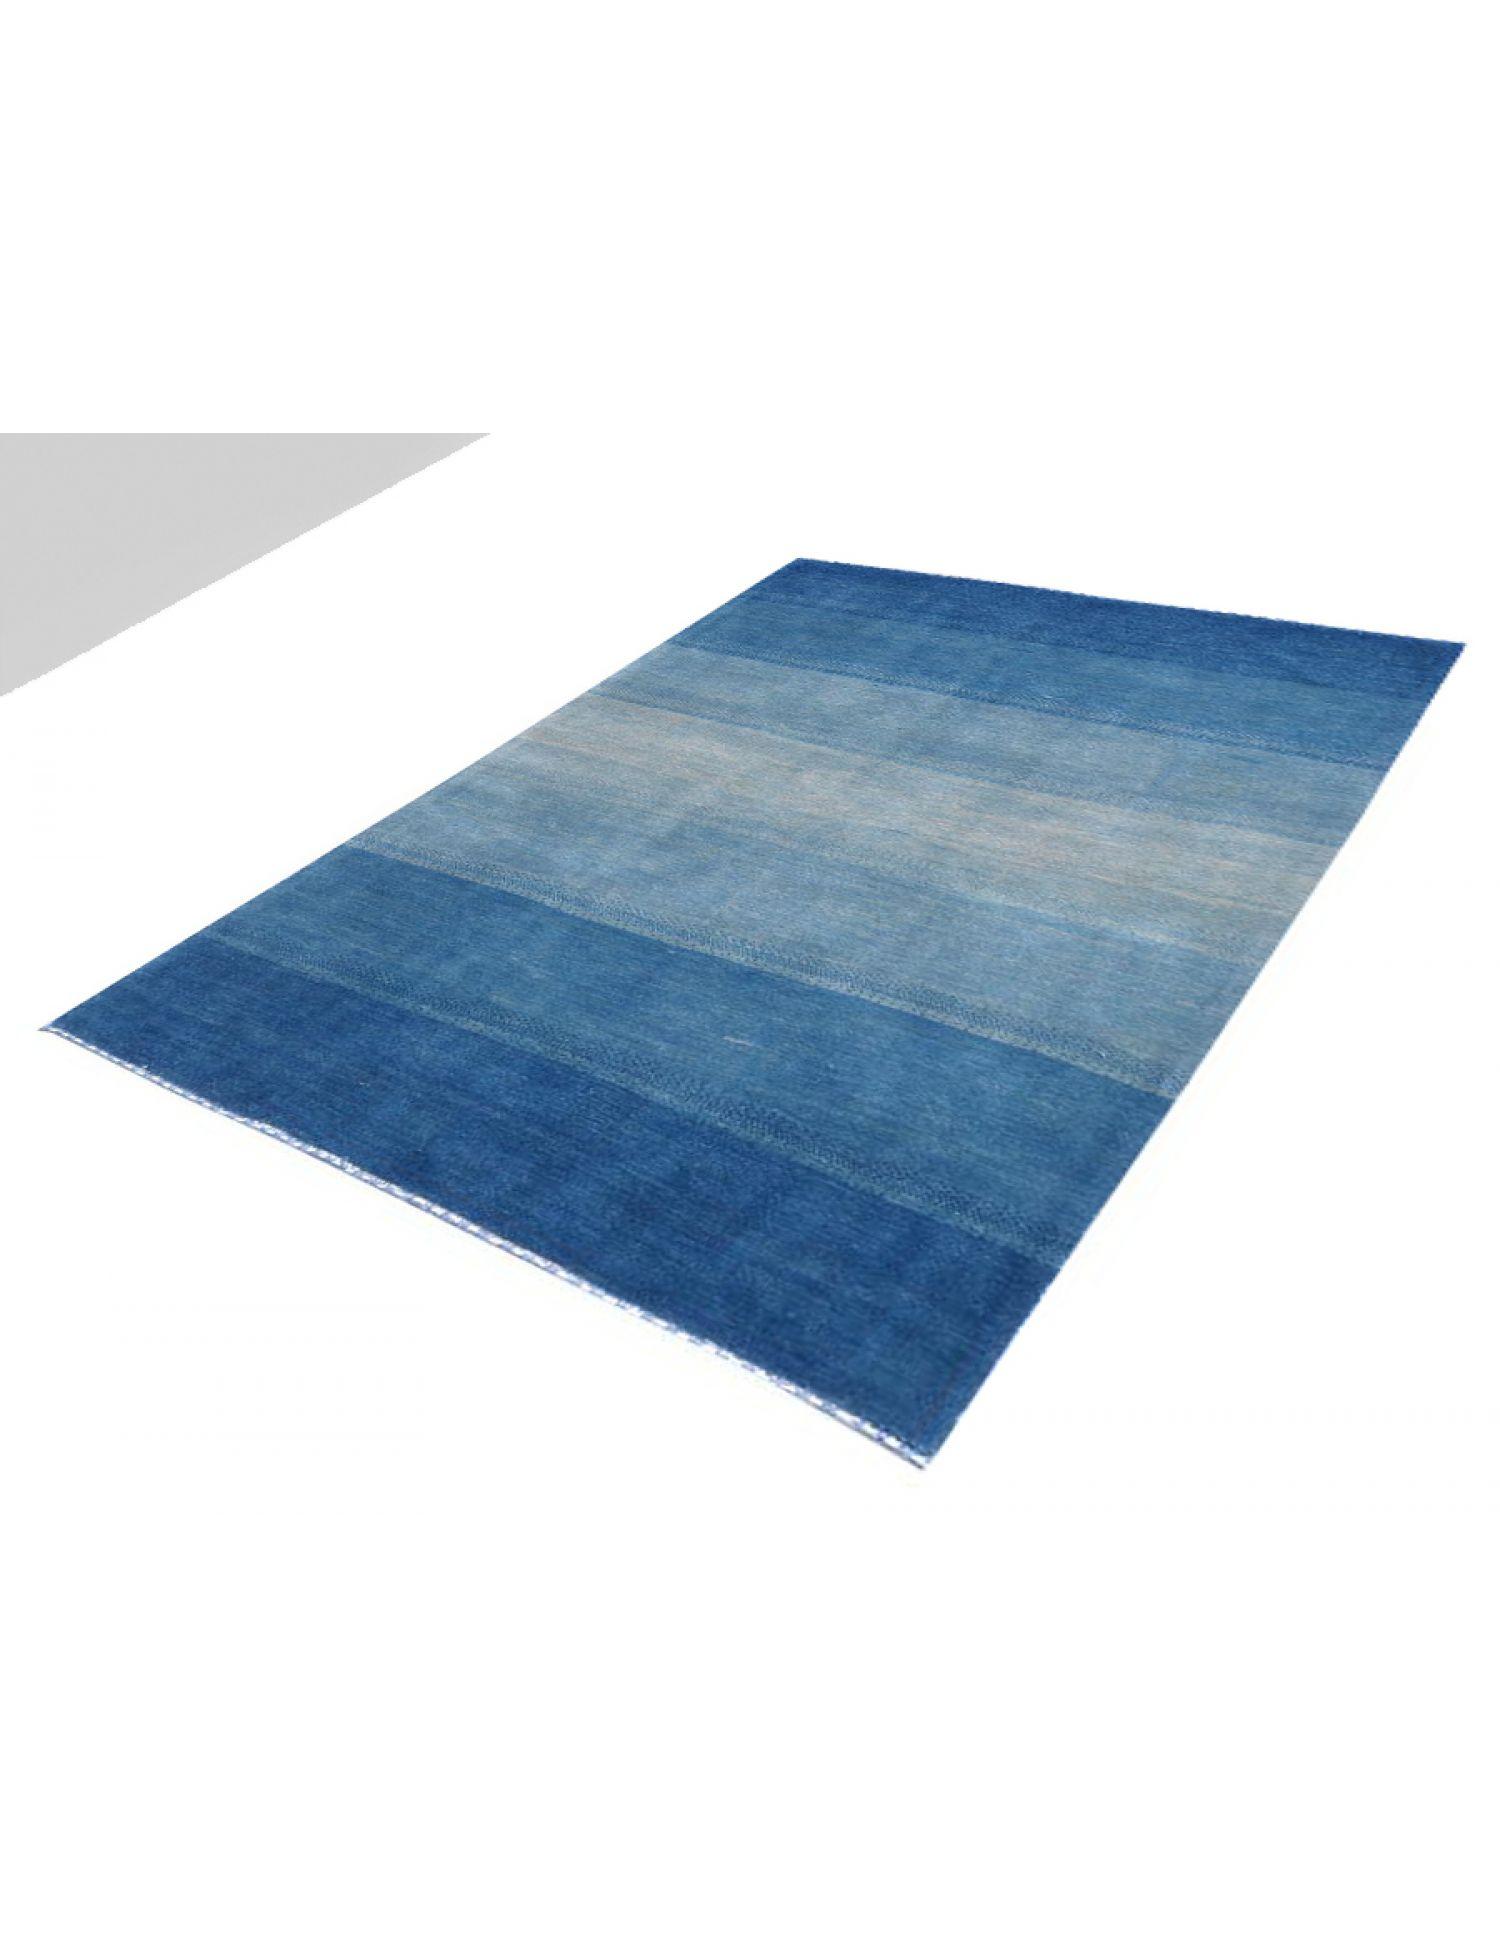 Moderne Teppiche  blau <br/>201 x 165 cm